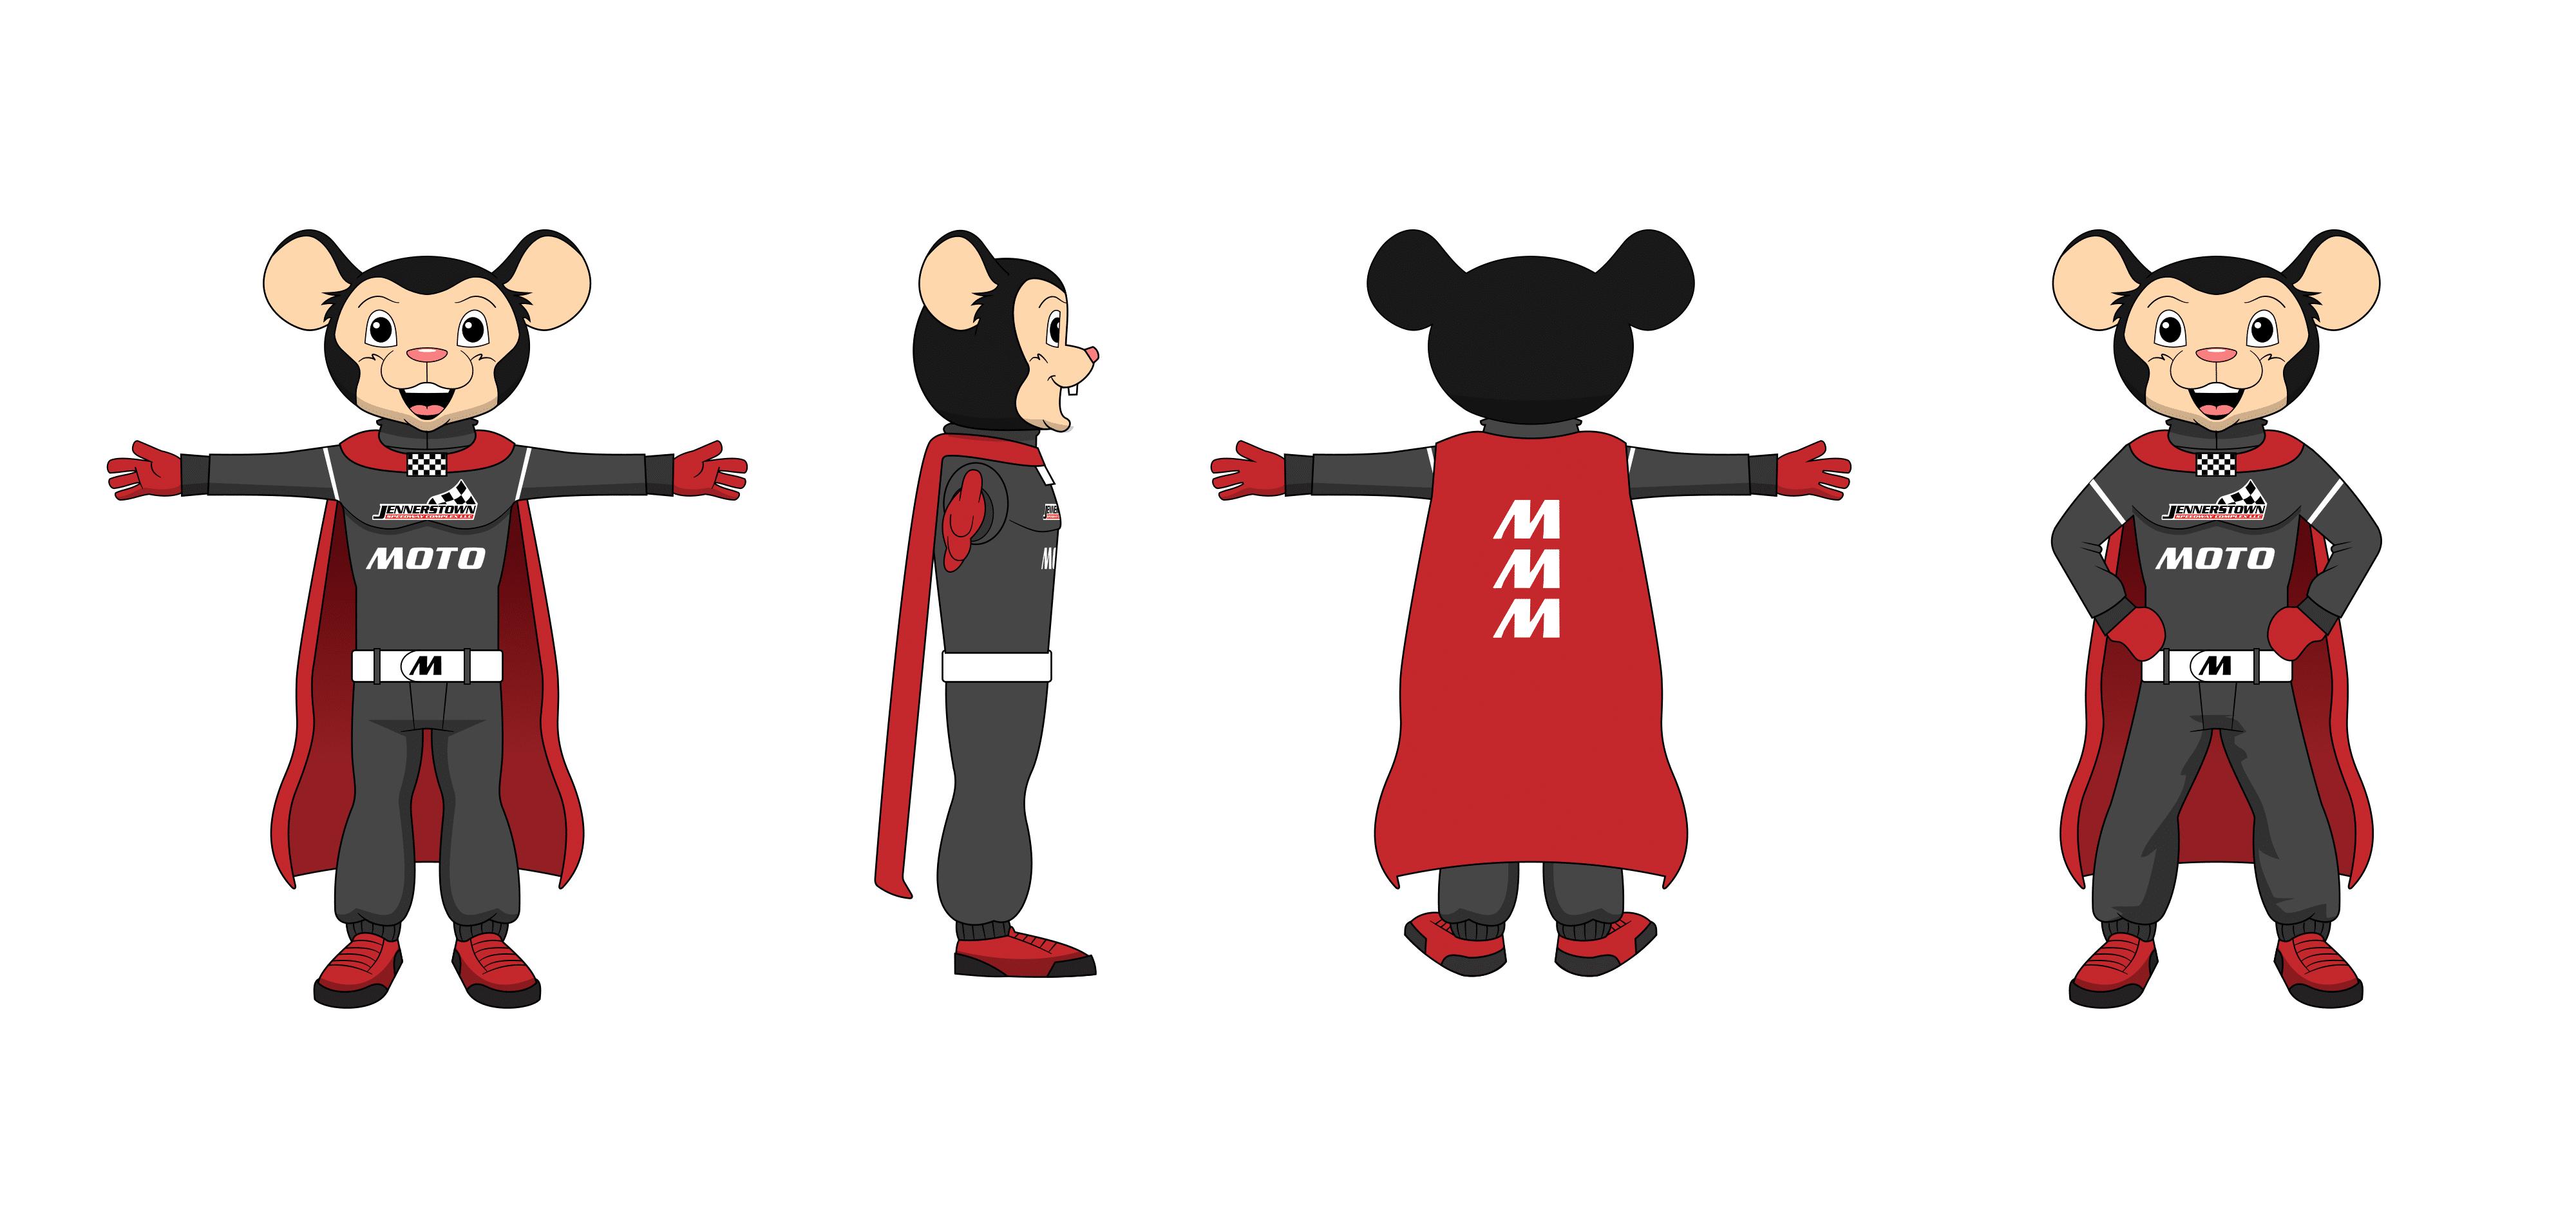 Moto Mouse Concept Illustration